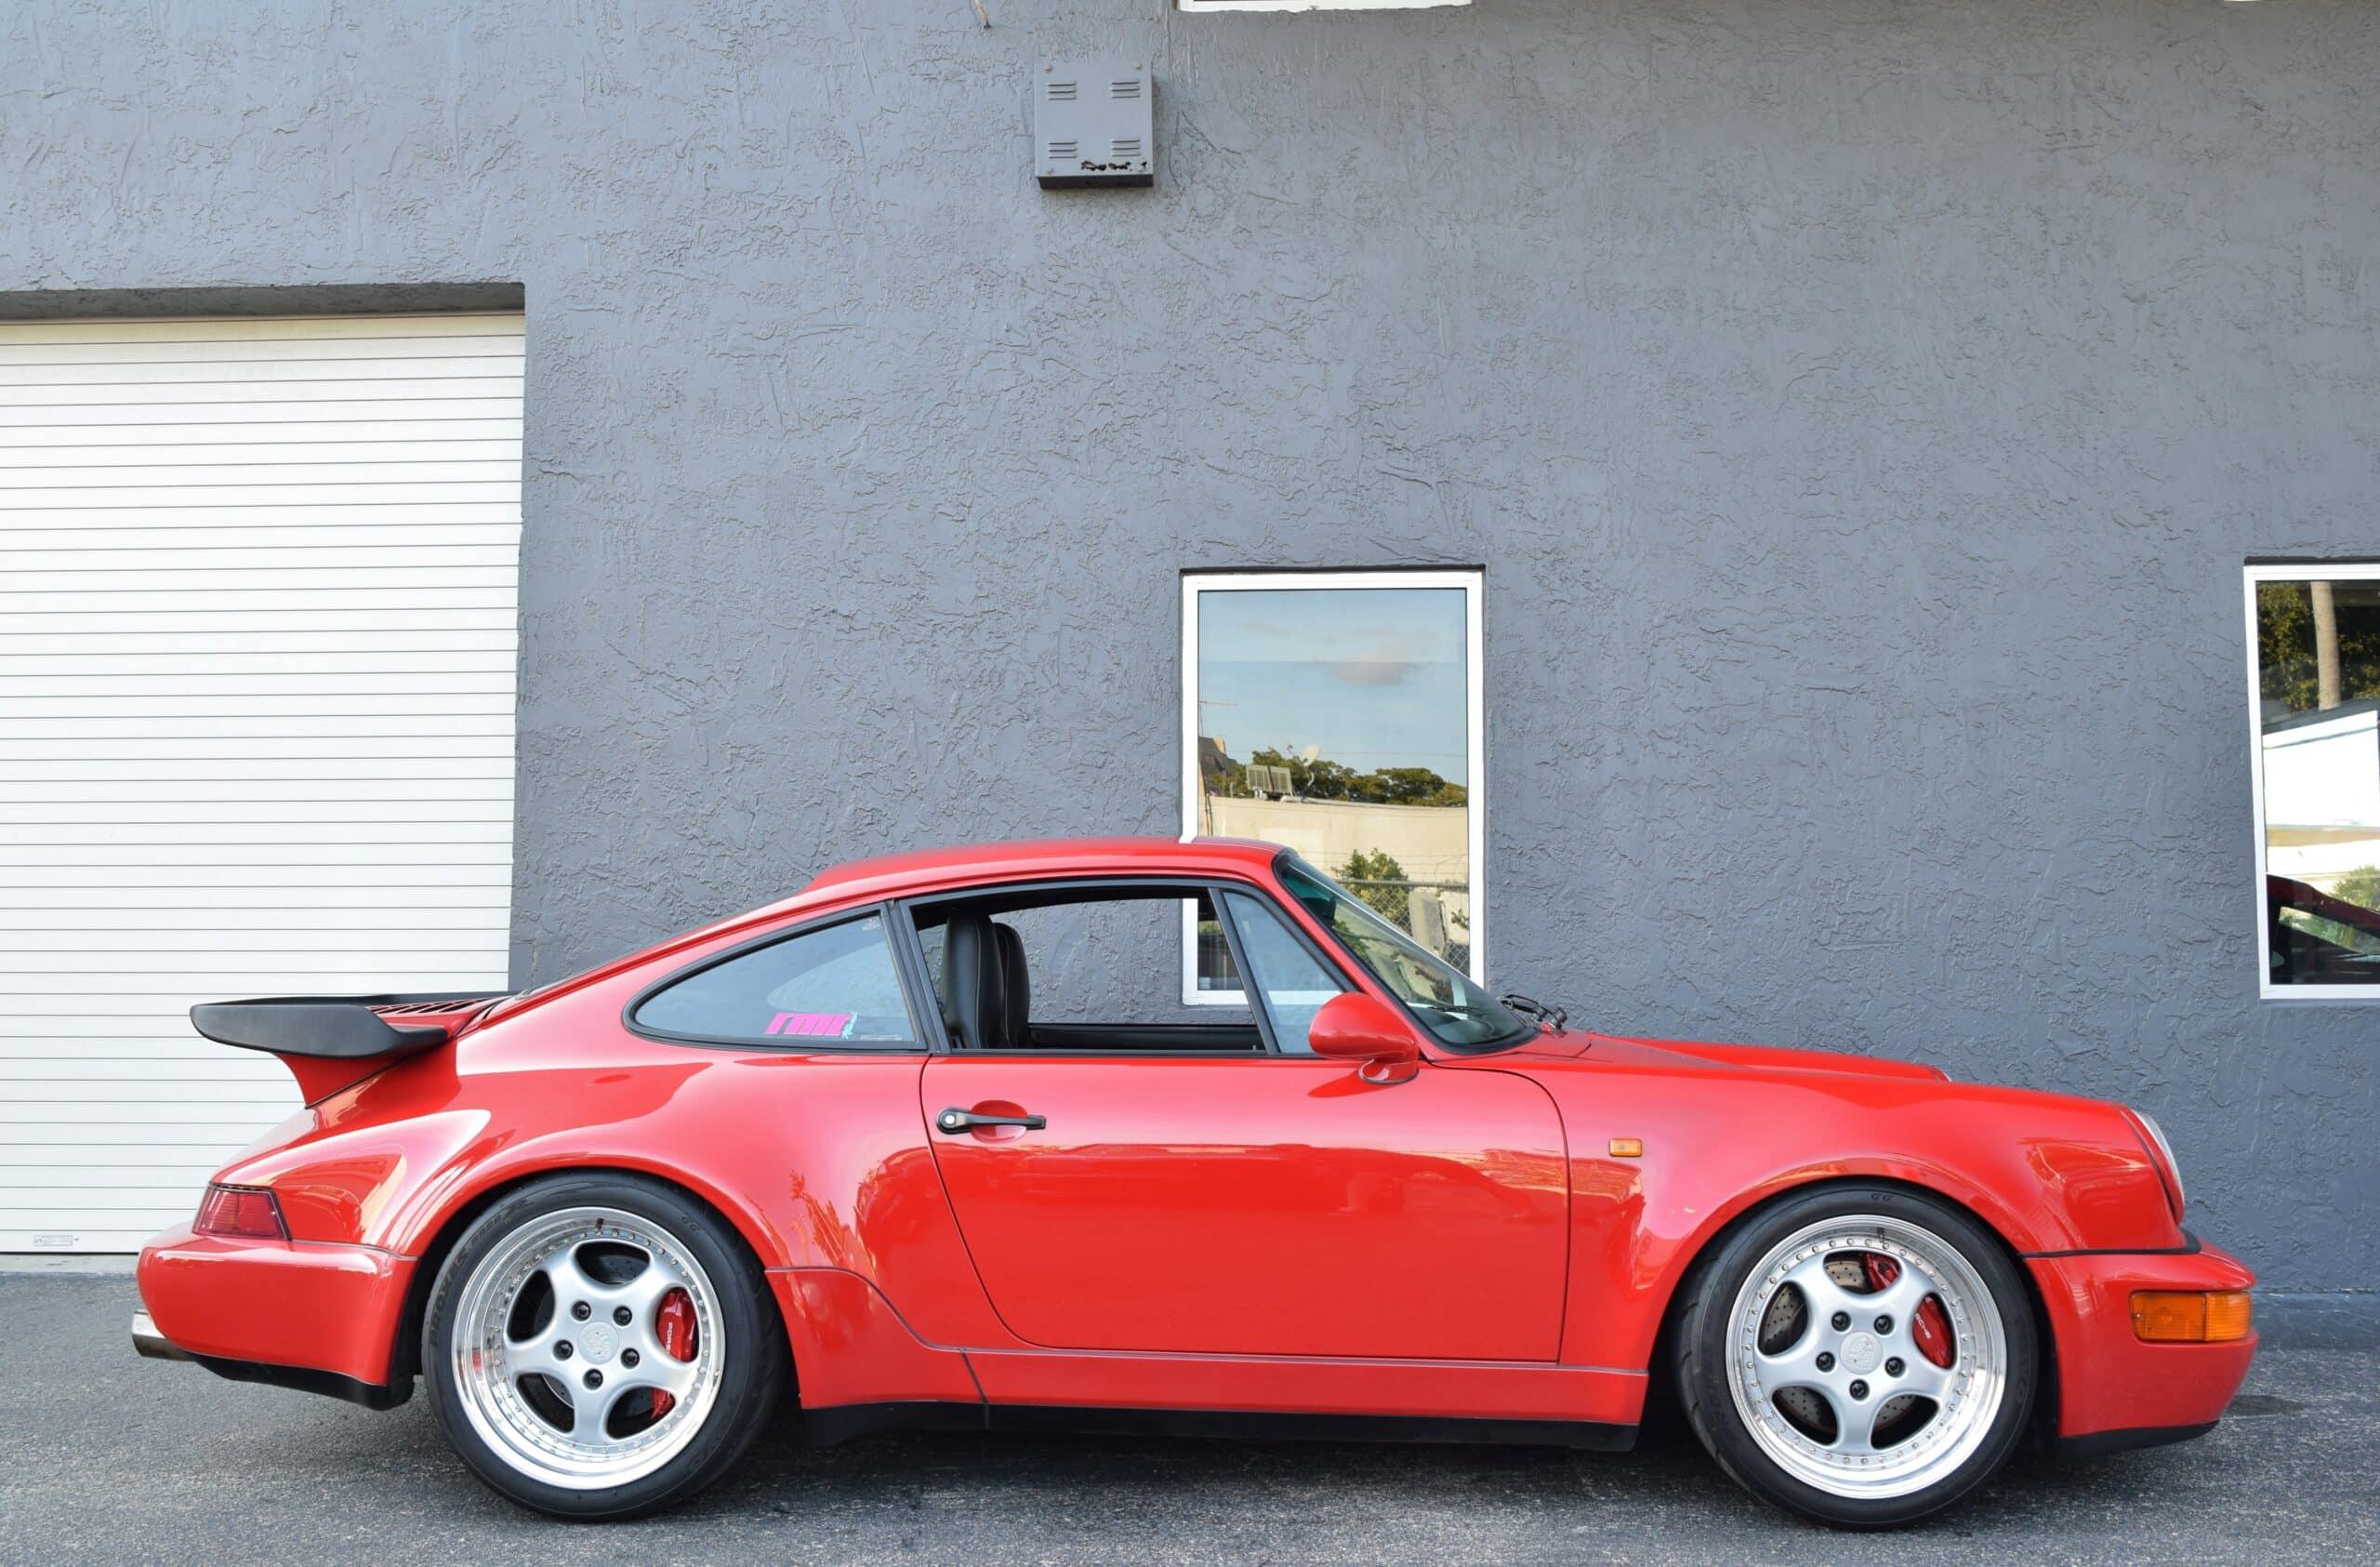 1991 Porsche 911 Turbo 964 28K Miles-Sunroof Delete-Big Brakes-3.8L Twin Plug – Limited Slip Differential